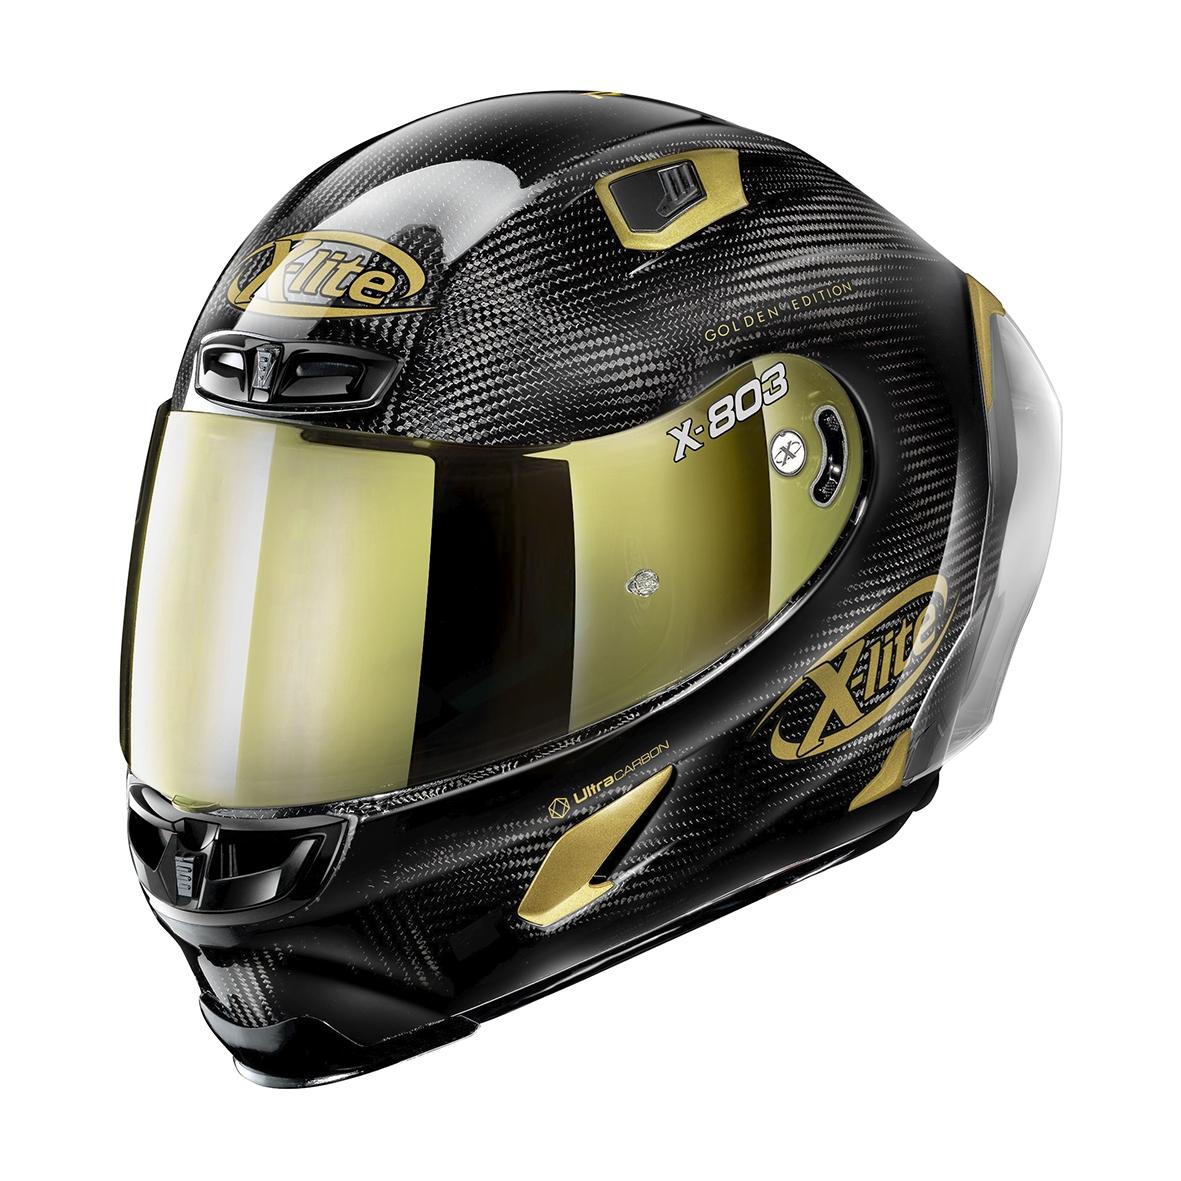 Moto helma X-Lite X-803 RS Ultra Carbon Gold Edition Carbon 33